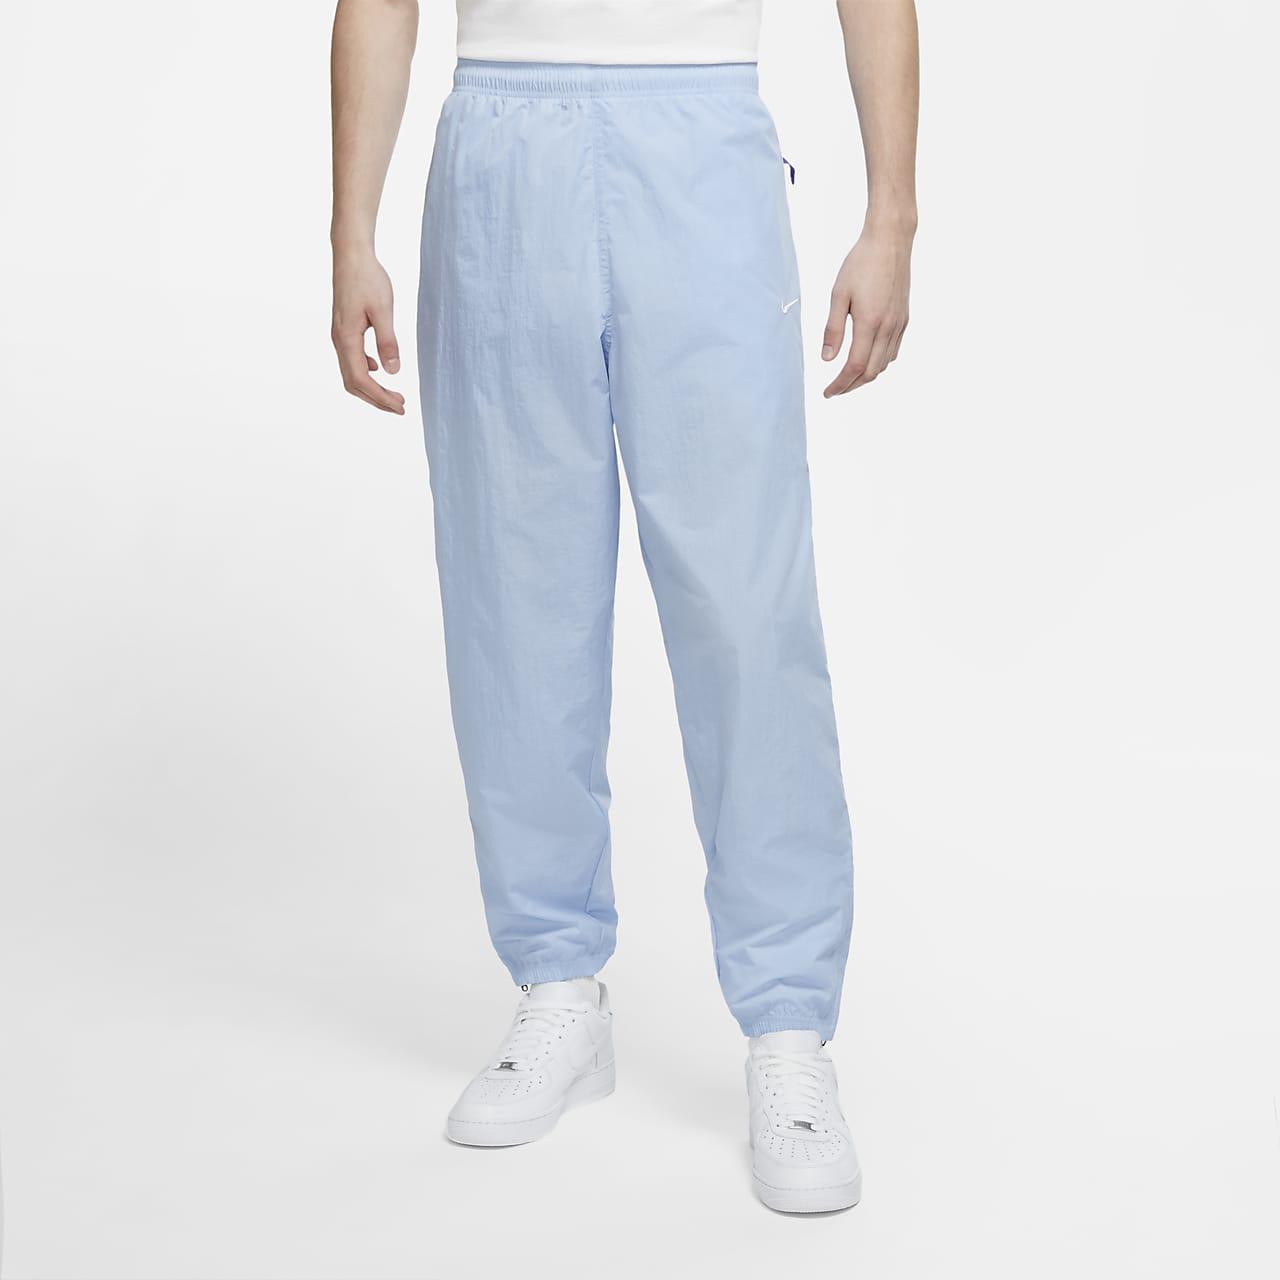 NikeLab 男子长裤